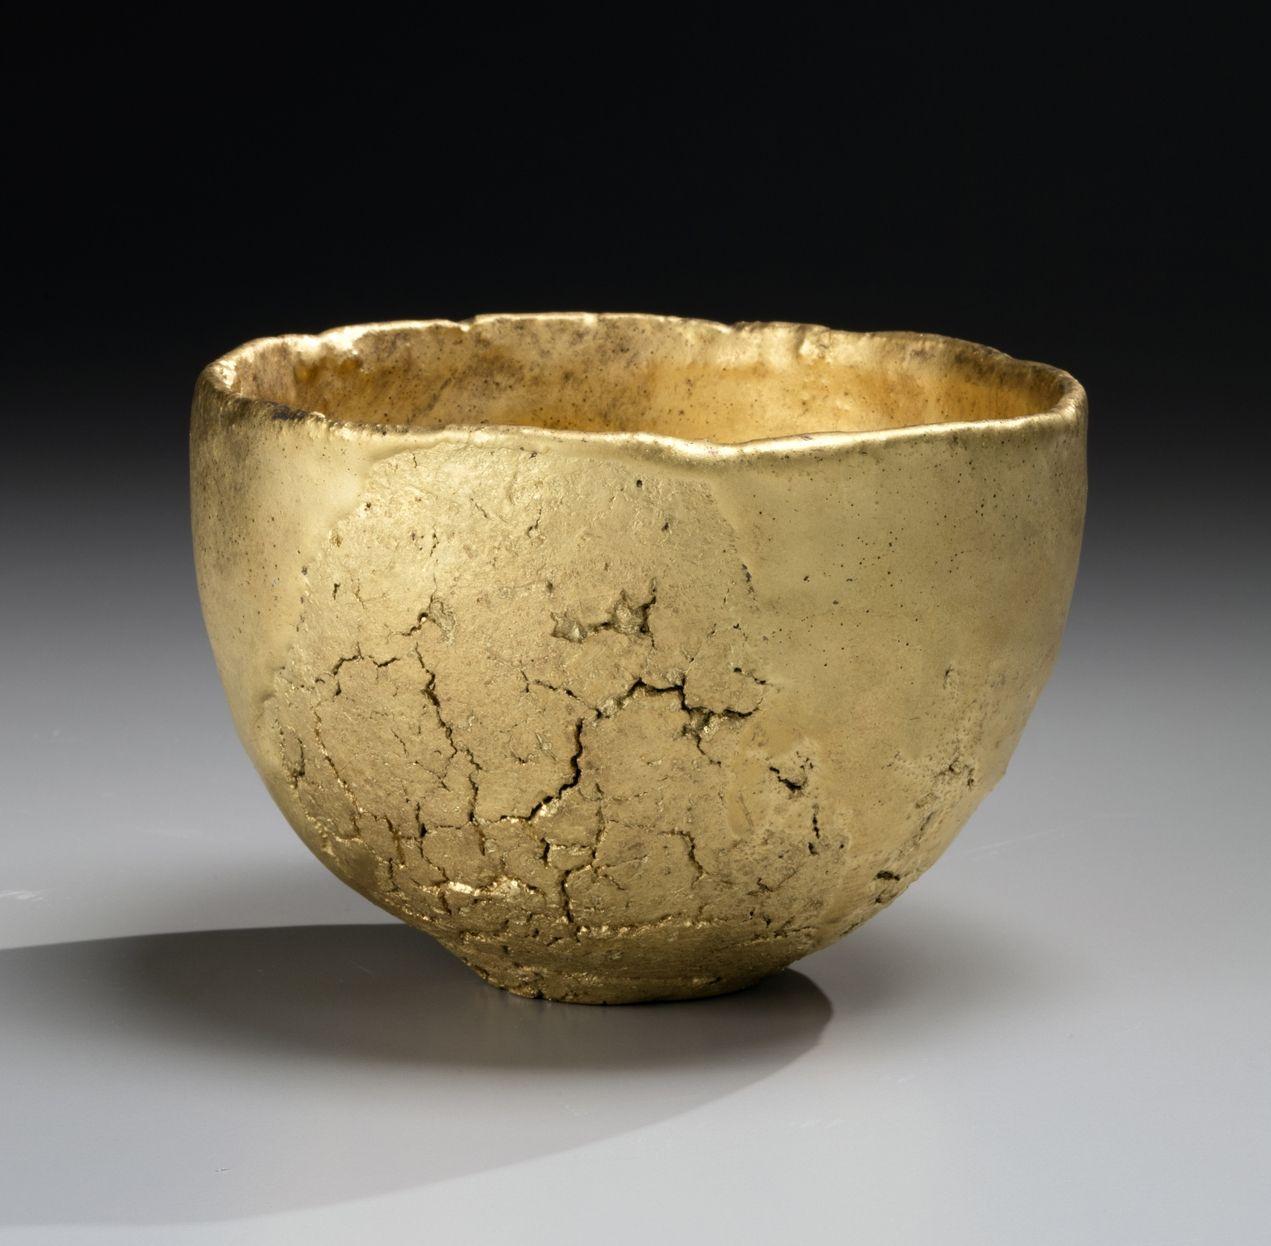 Ogawa Machiko (b 1946), Teabowl